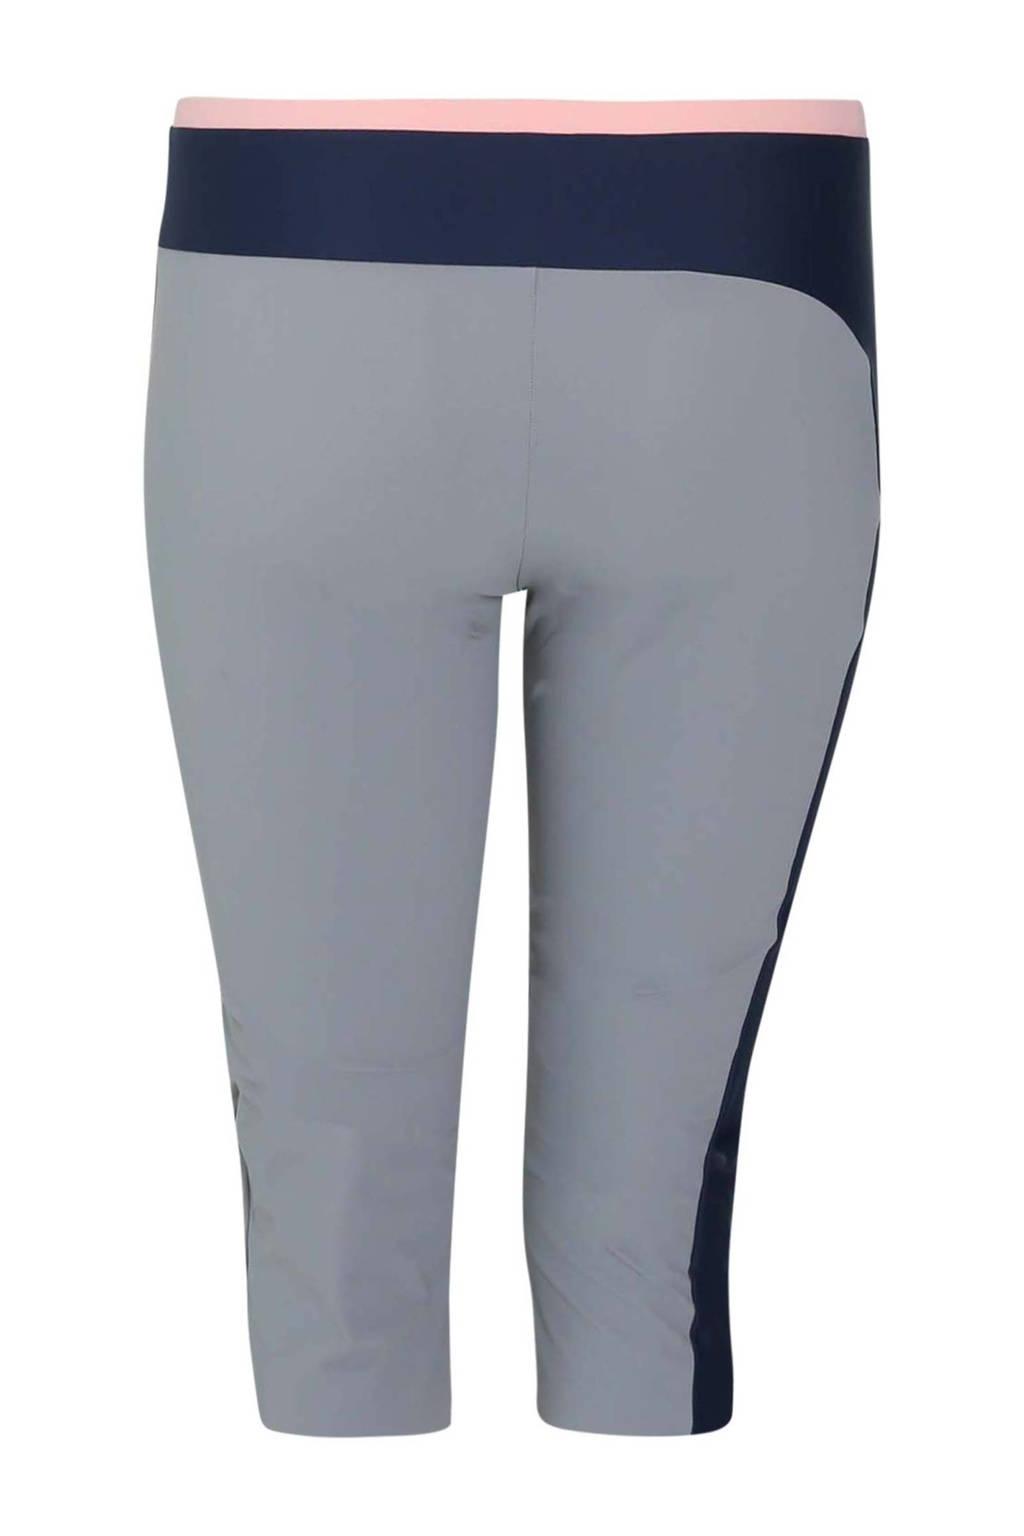 Paprika LUZ x Paprika Plus Size sportcapri Paloma grijs/marineblauw/roze